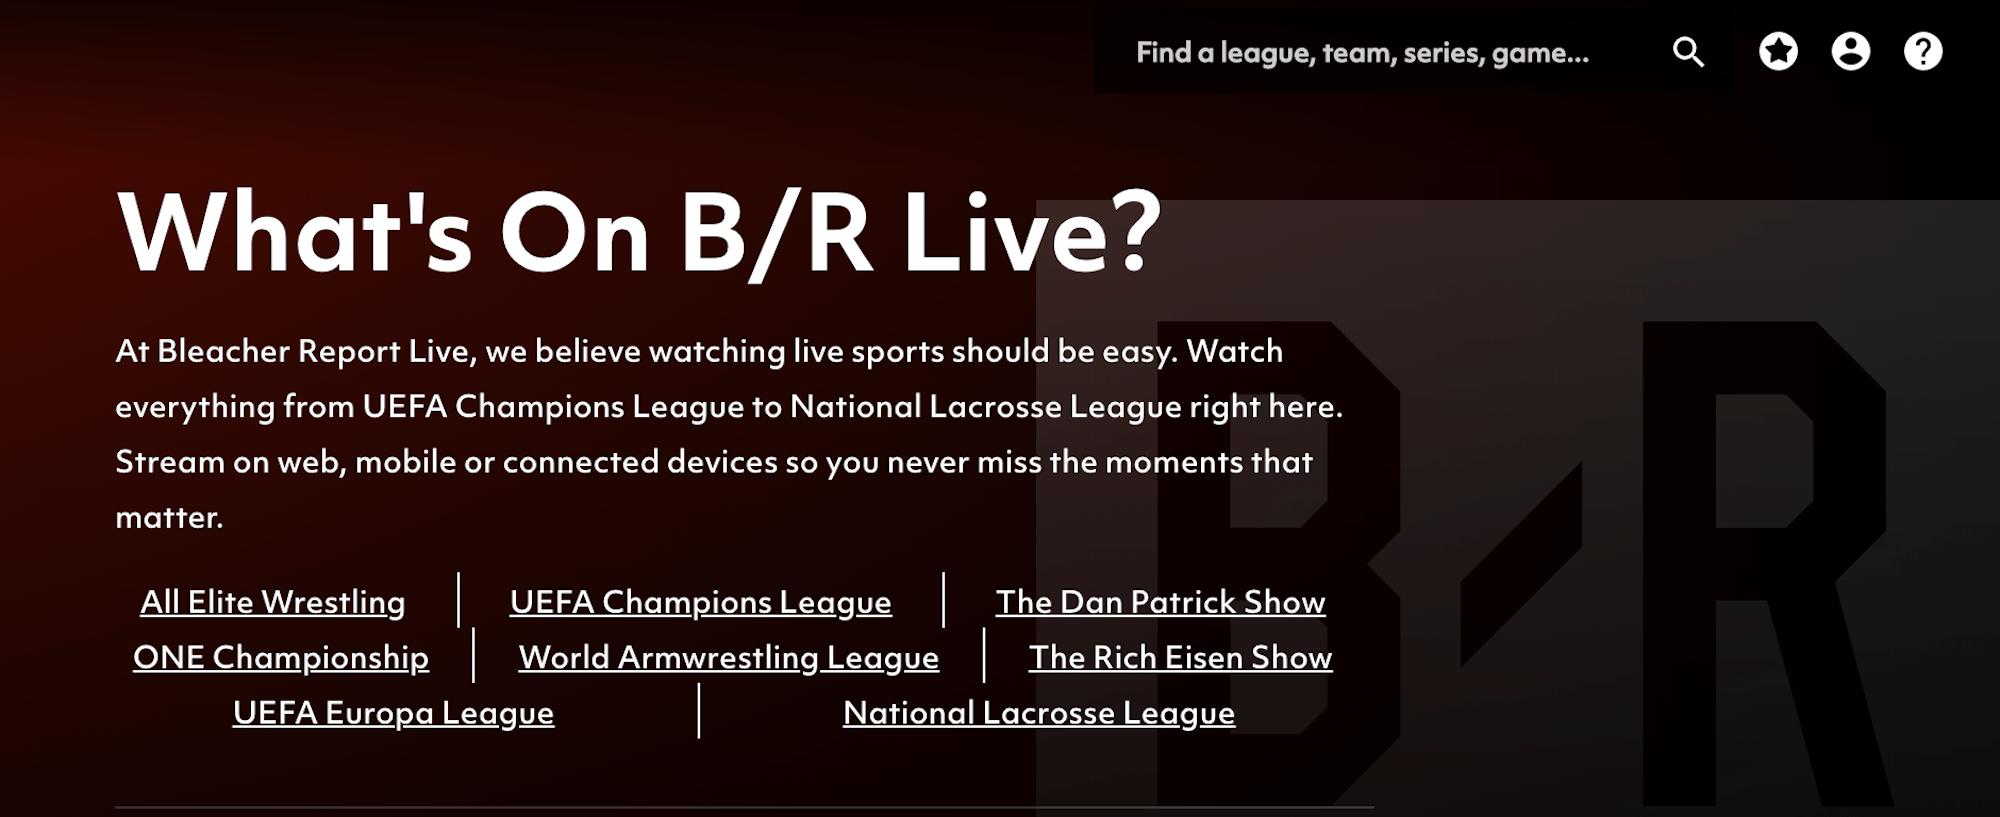 2019-20-uefa champions league barcelona vs inter milan soccer live stream free b-r live